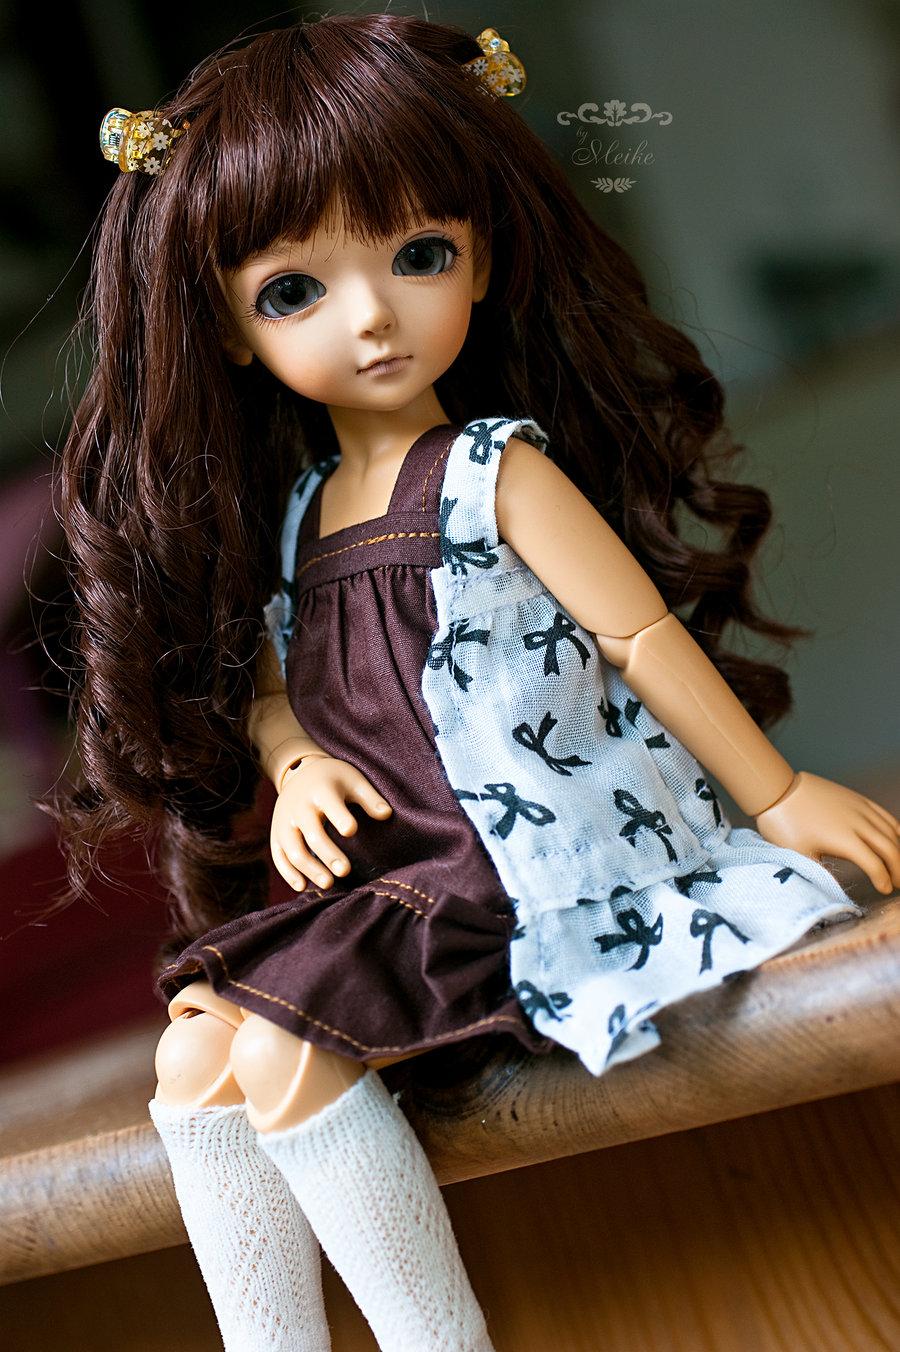 Cute curly hairs joint dolls - Pics cute dolls ...